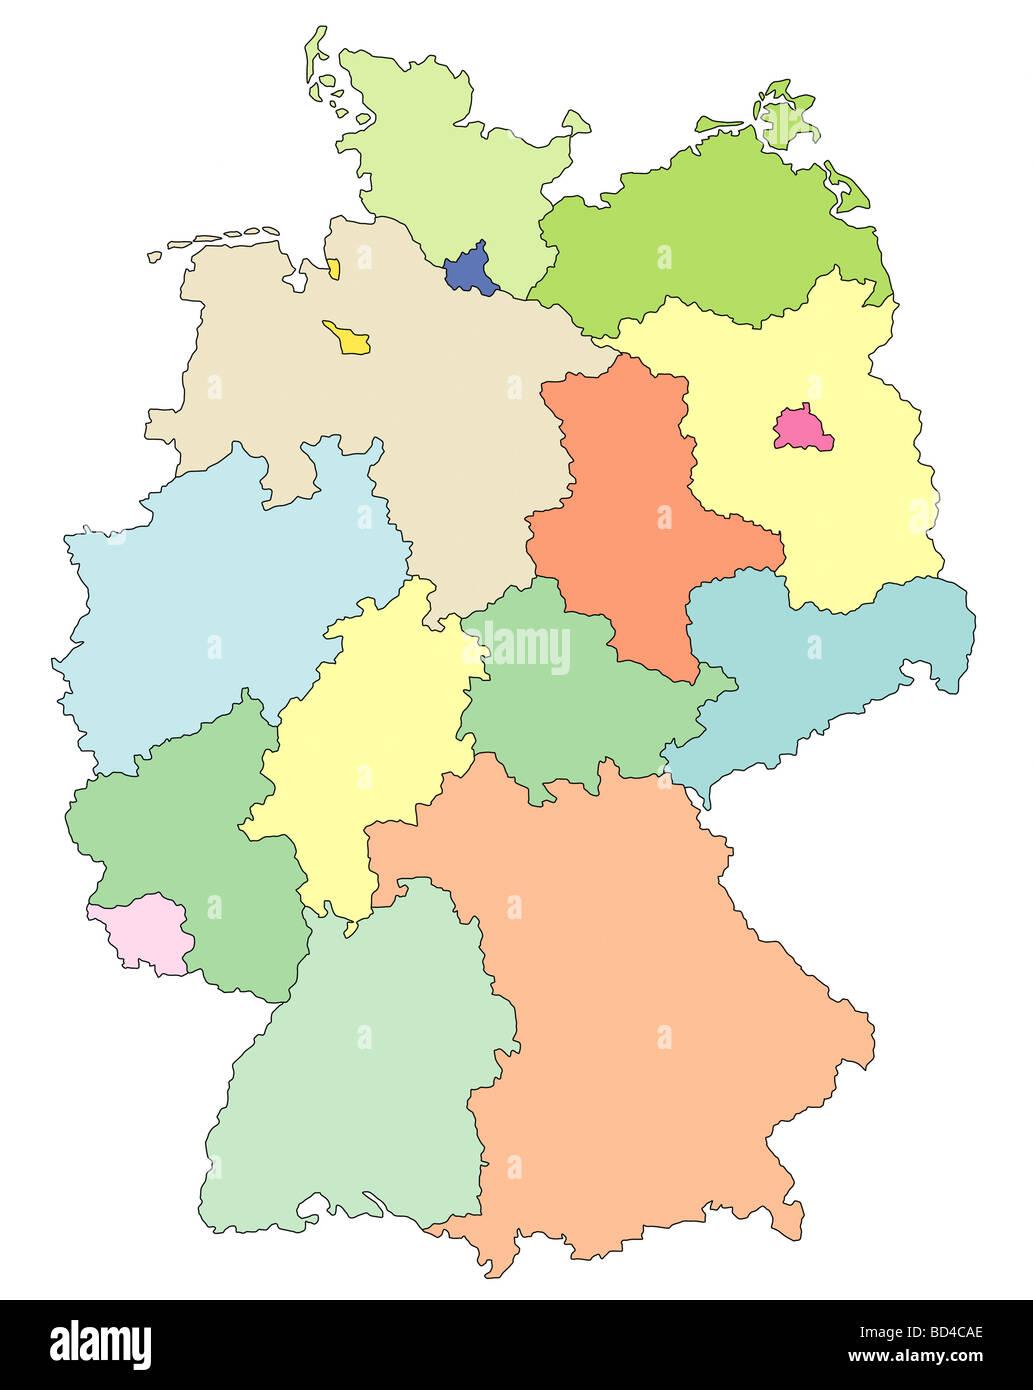 Germany Map With States.Germany Map With States Stock Photo 25298406 Alamy